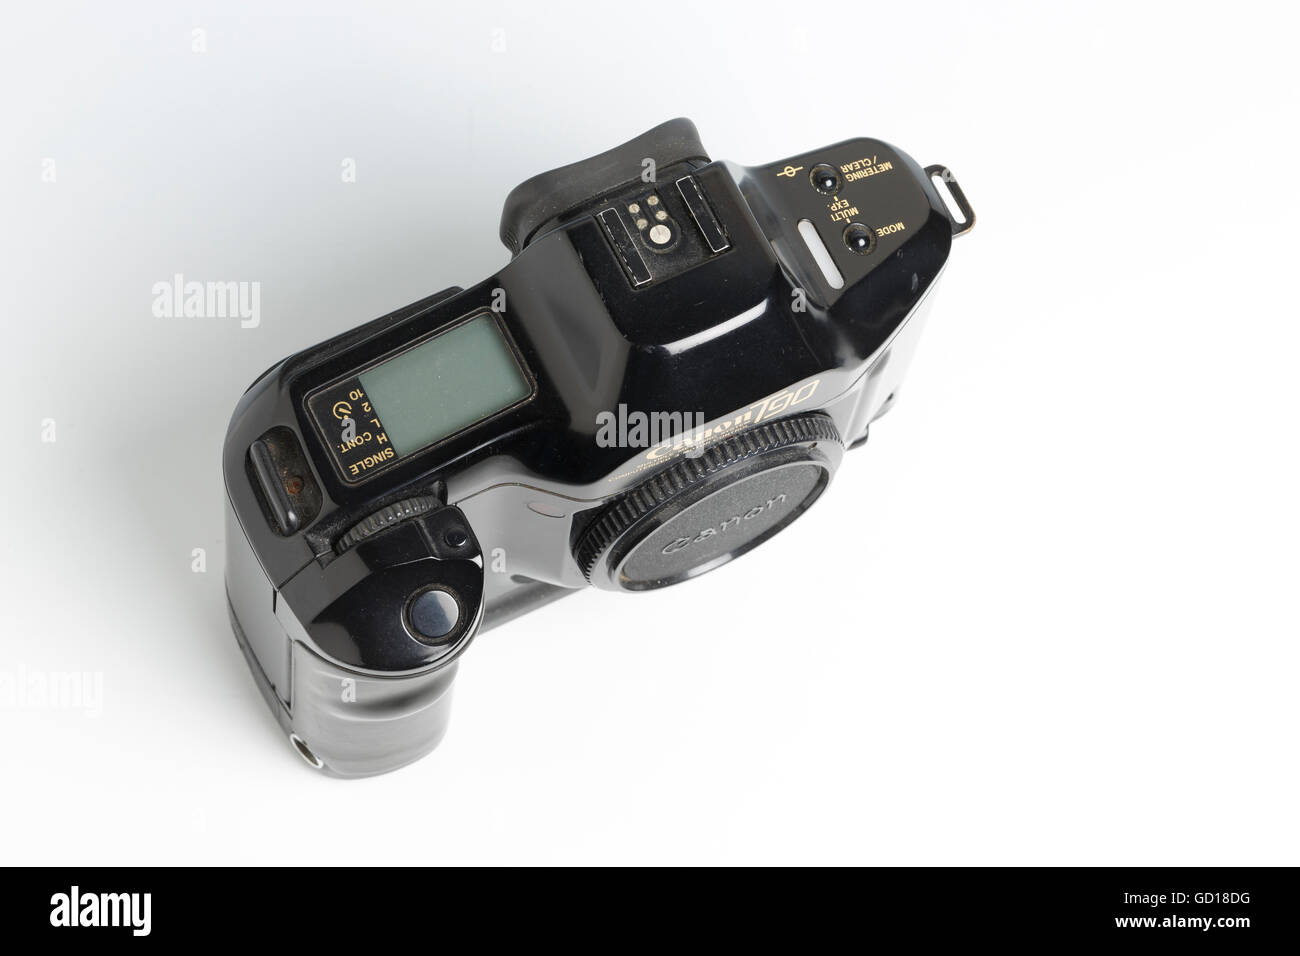 Canon T90 SLR camera, with automatic film advance and ergonomic design, or 'bio-form'. Designed by Luigi - Stock Image